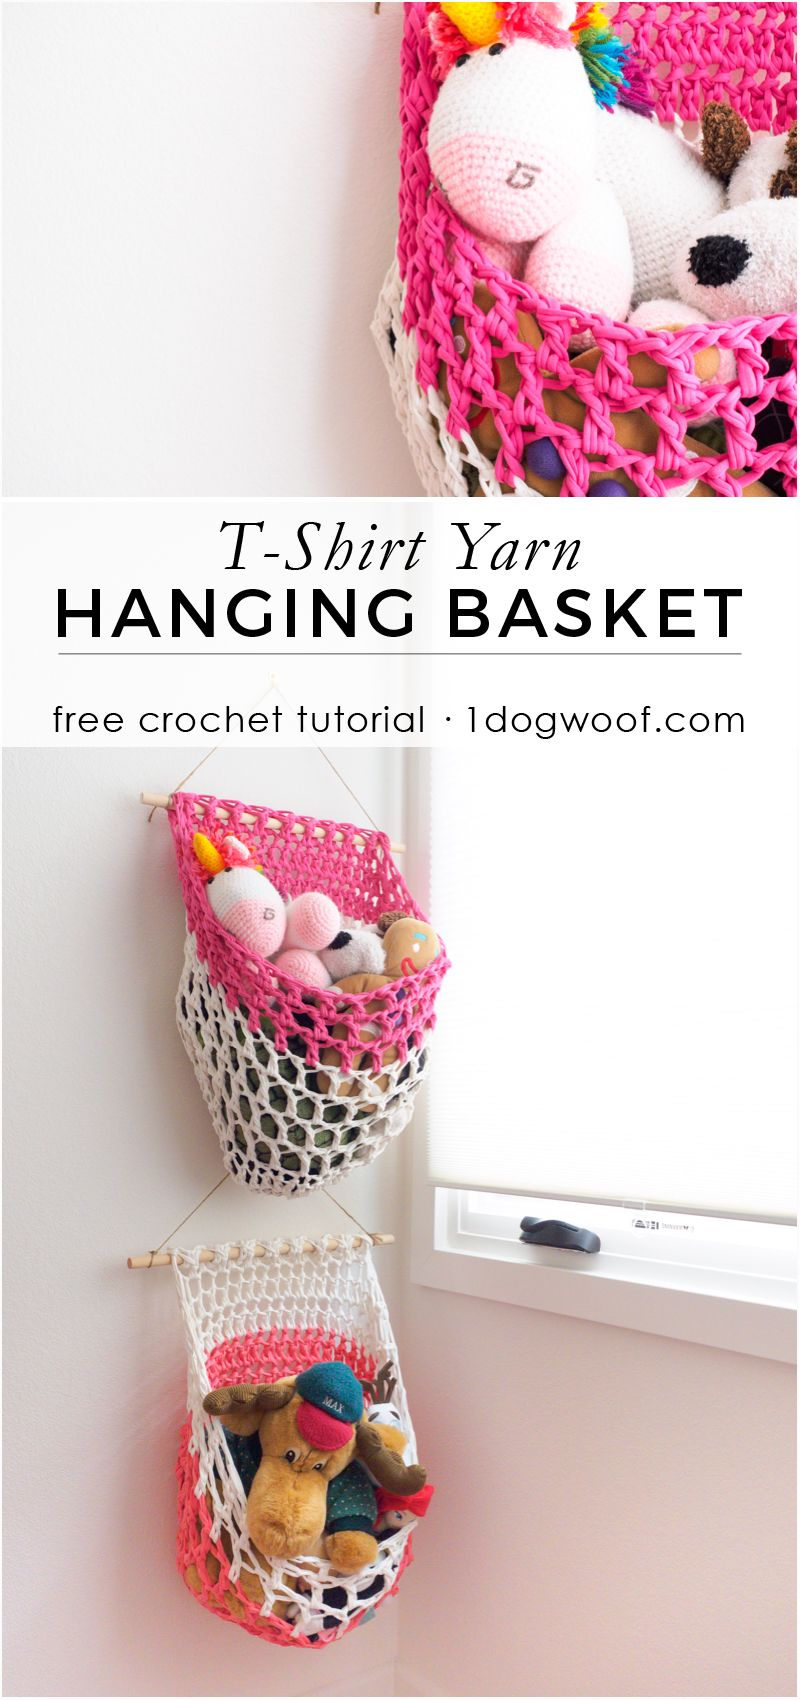 T-Shirt Yarn Hanging Basket Crochet Pattern | Fabric yarn, Mesh ...